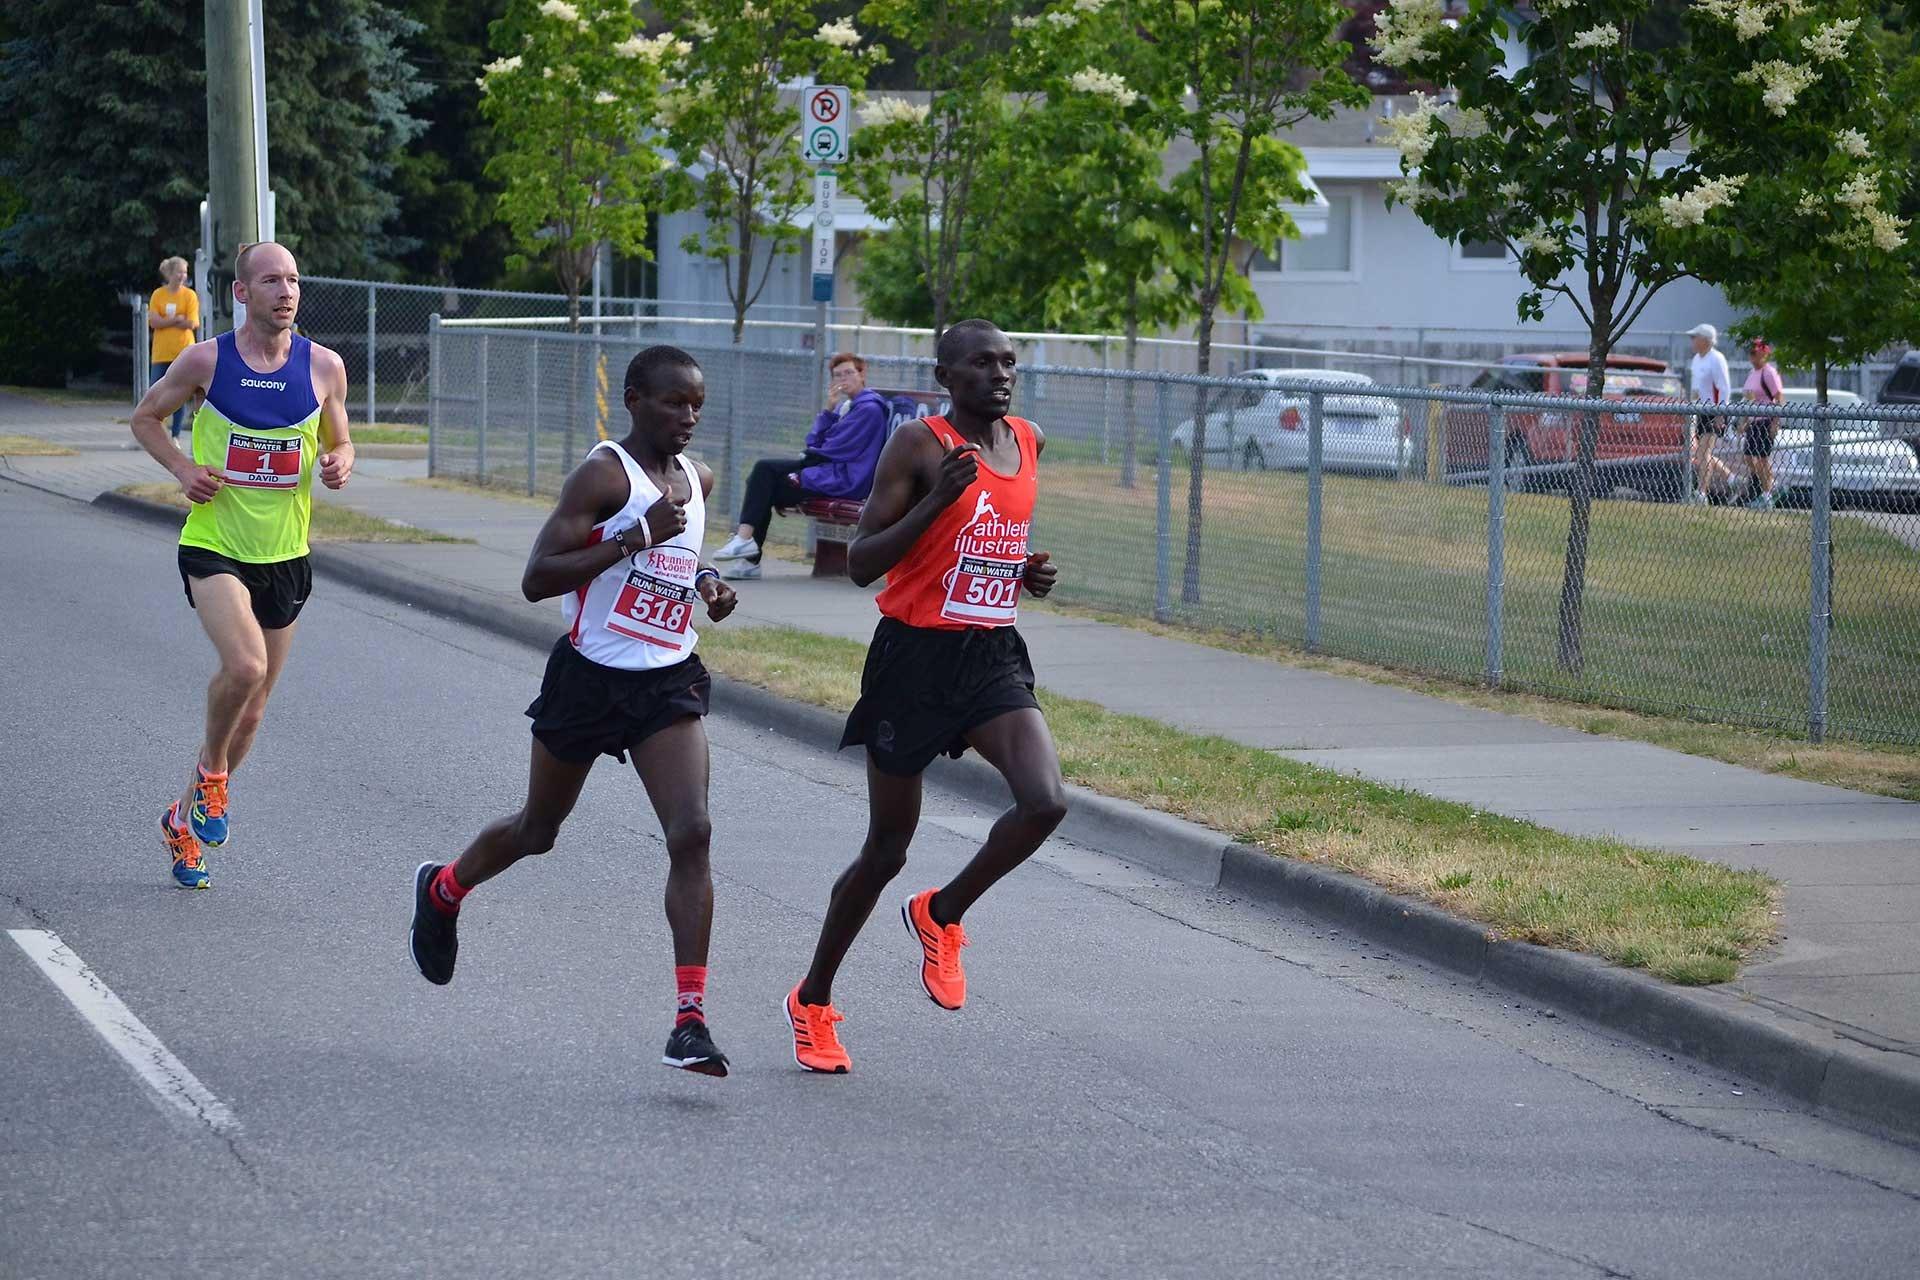 Half Marathon Runners